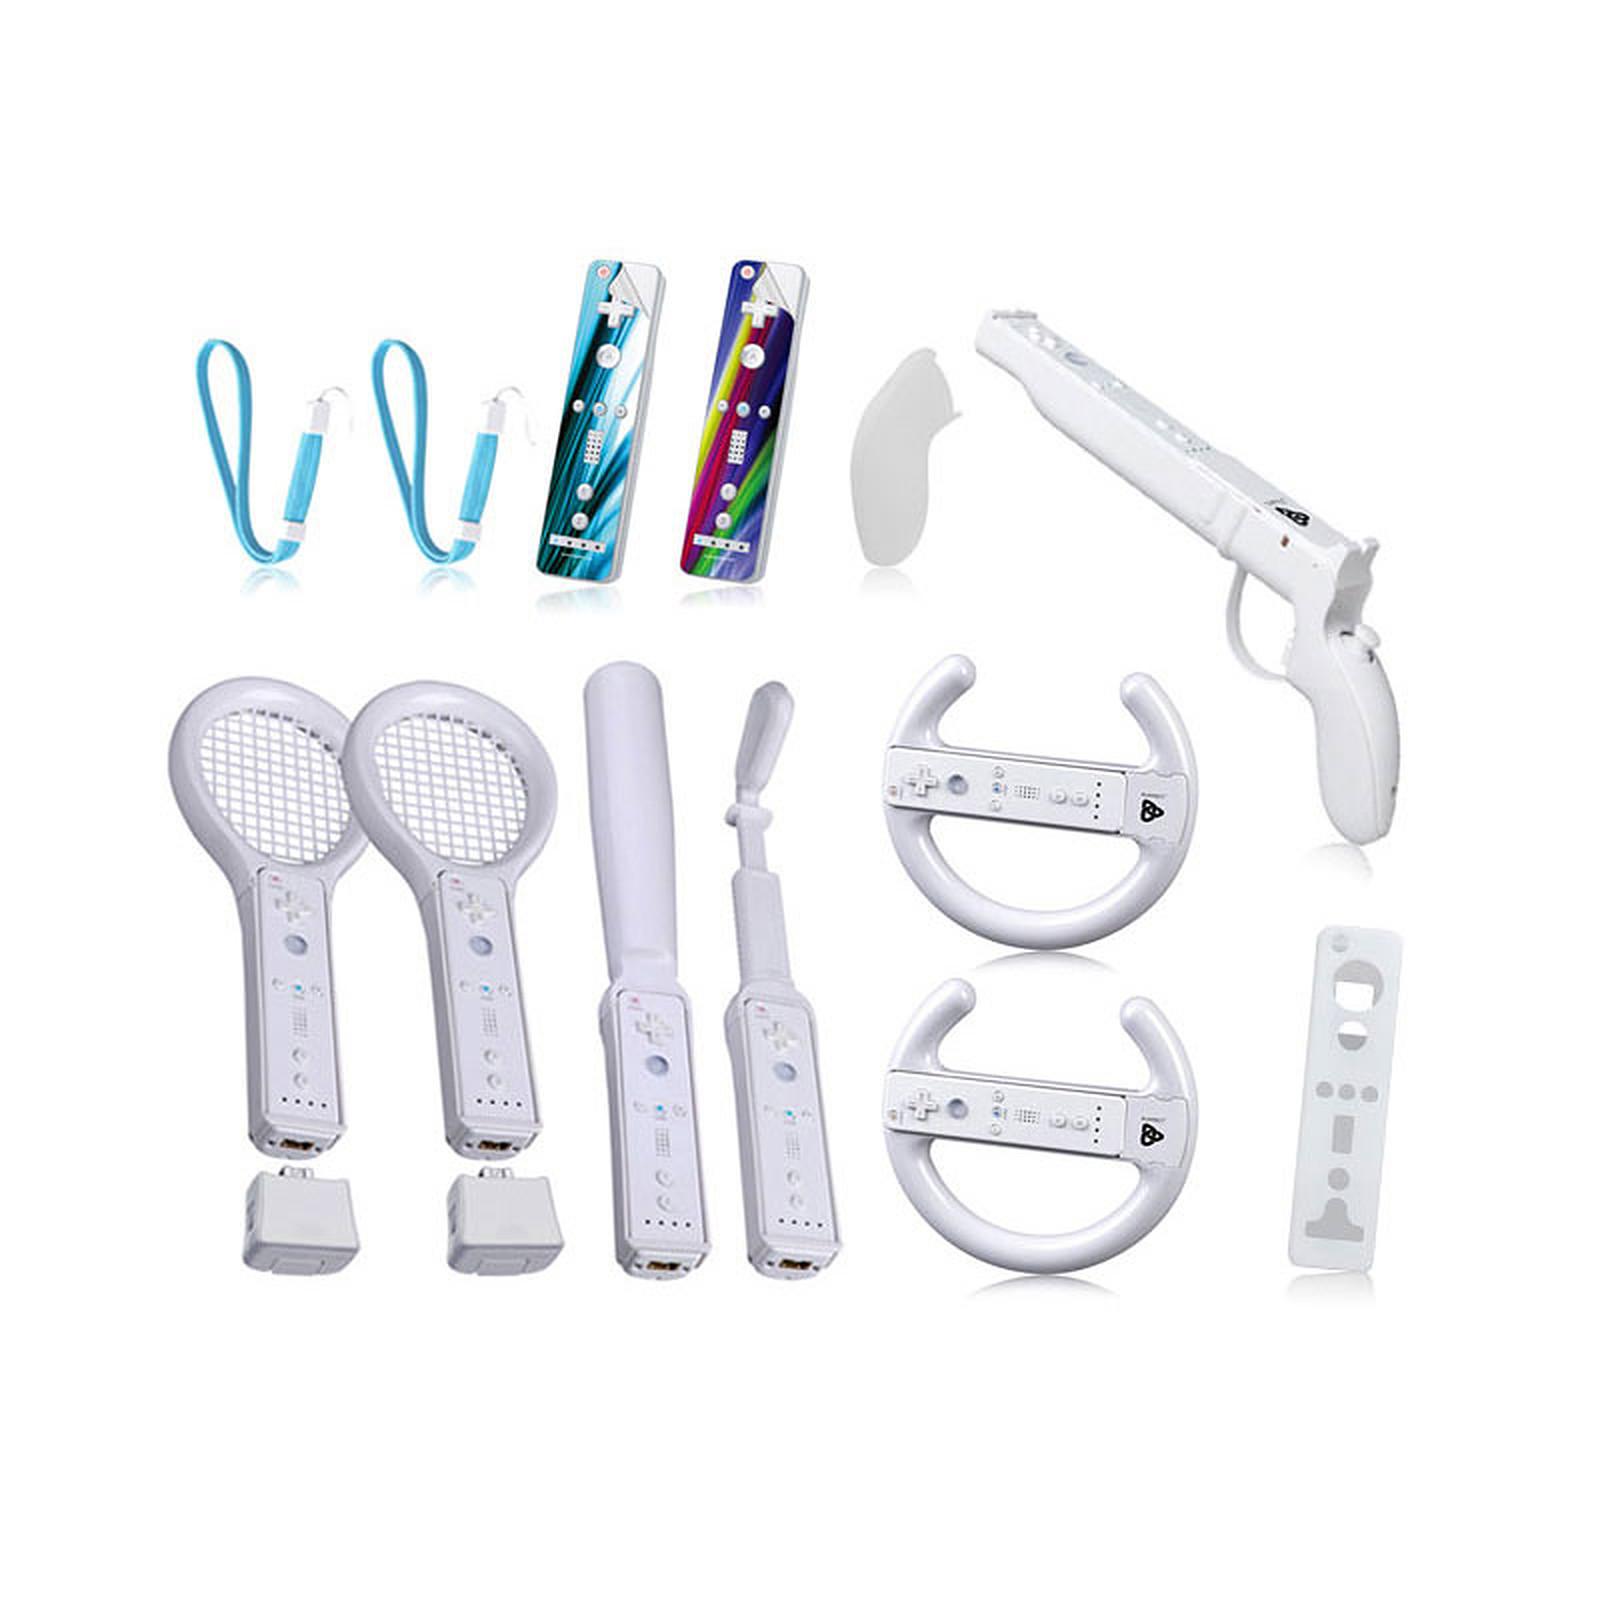 Playfect XL Jumbo Kit 15-en-1 Blanc (Wii)